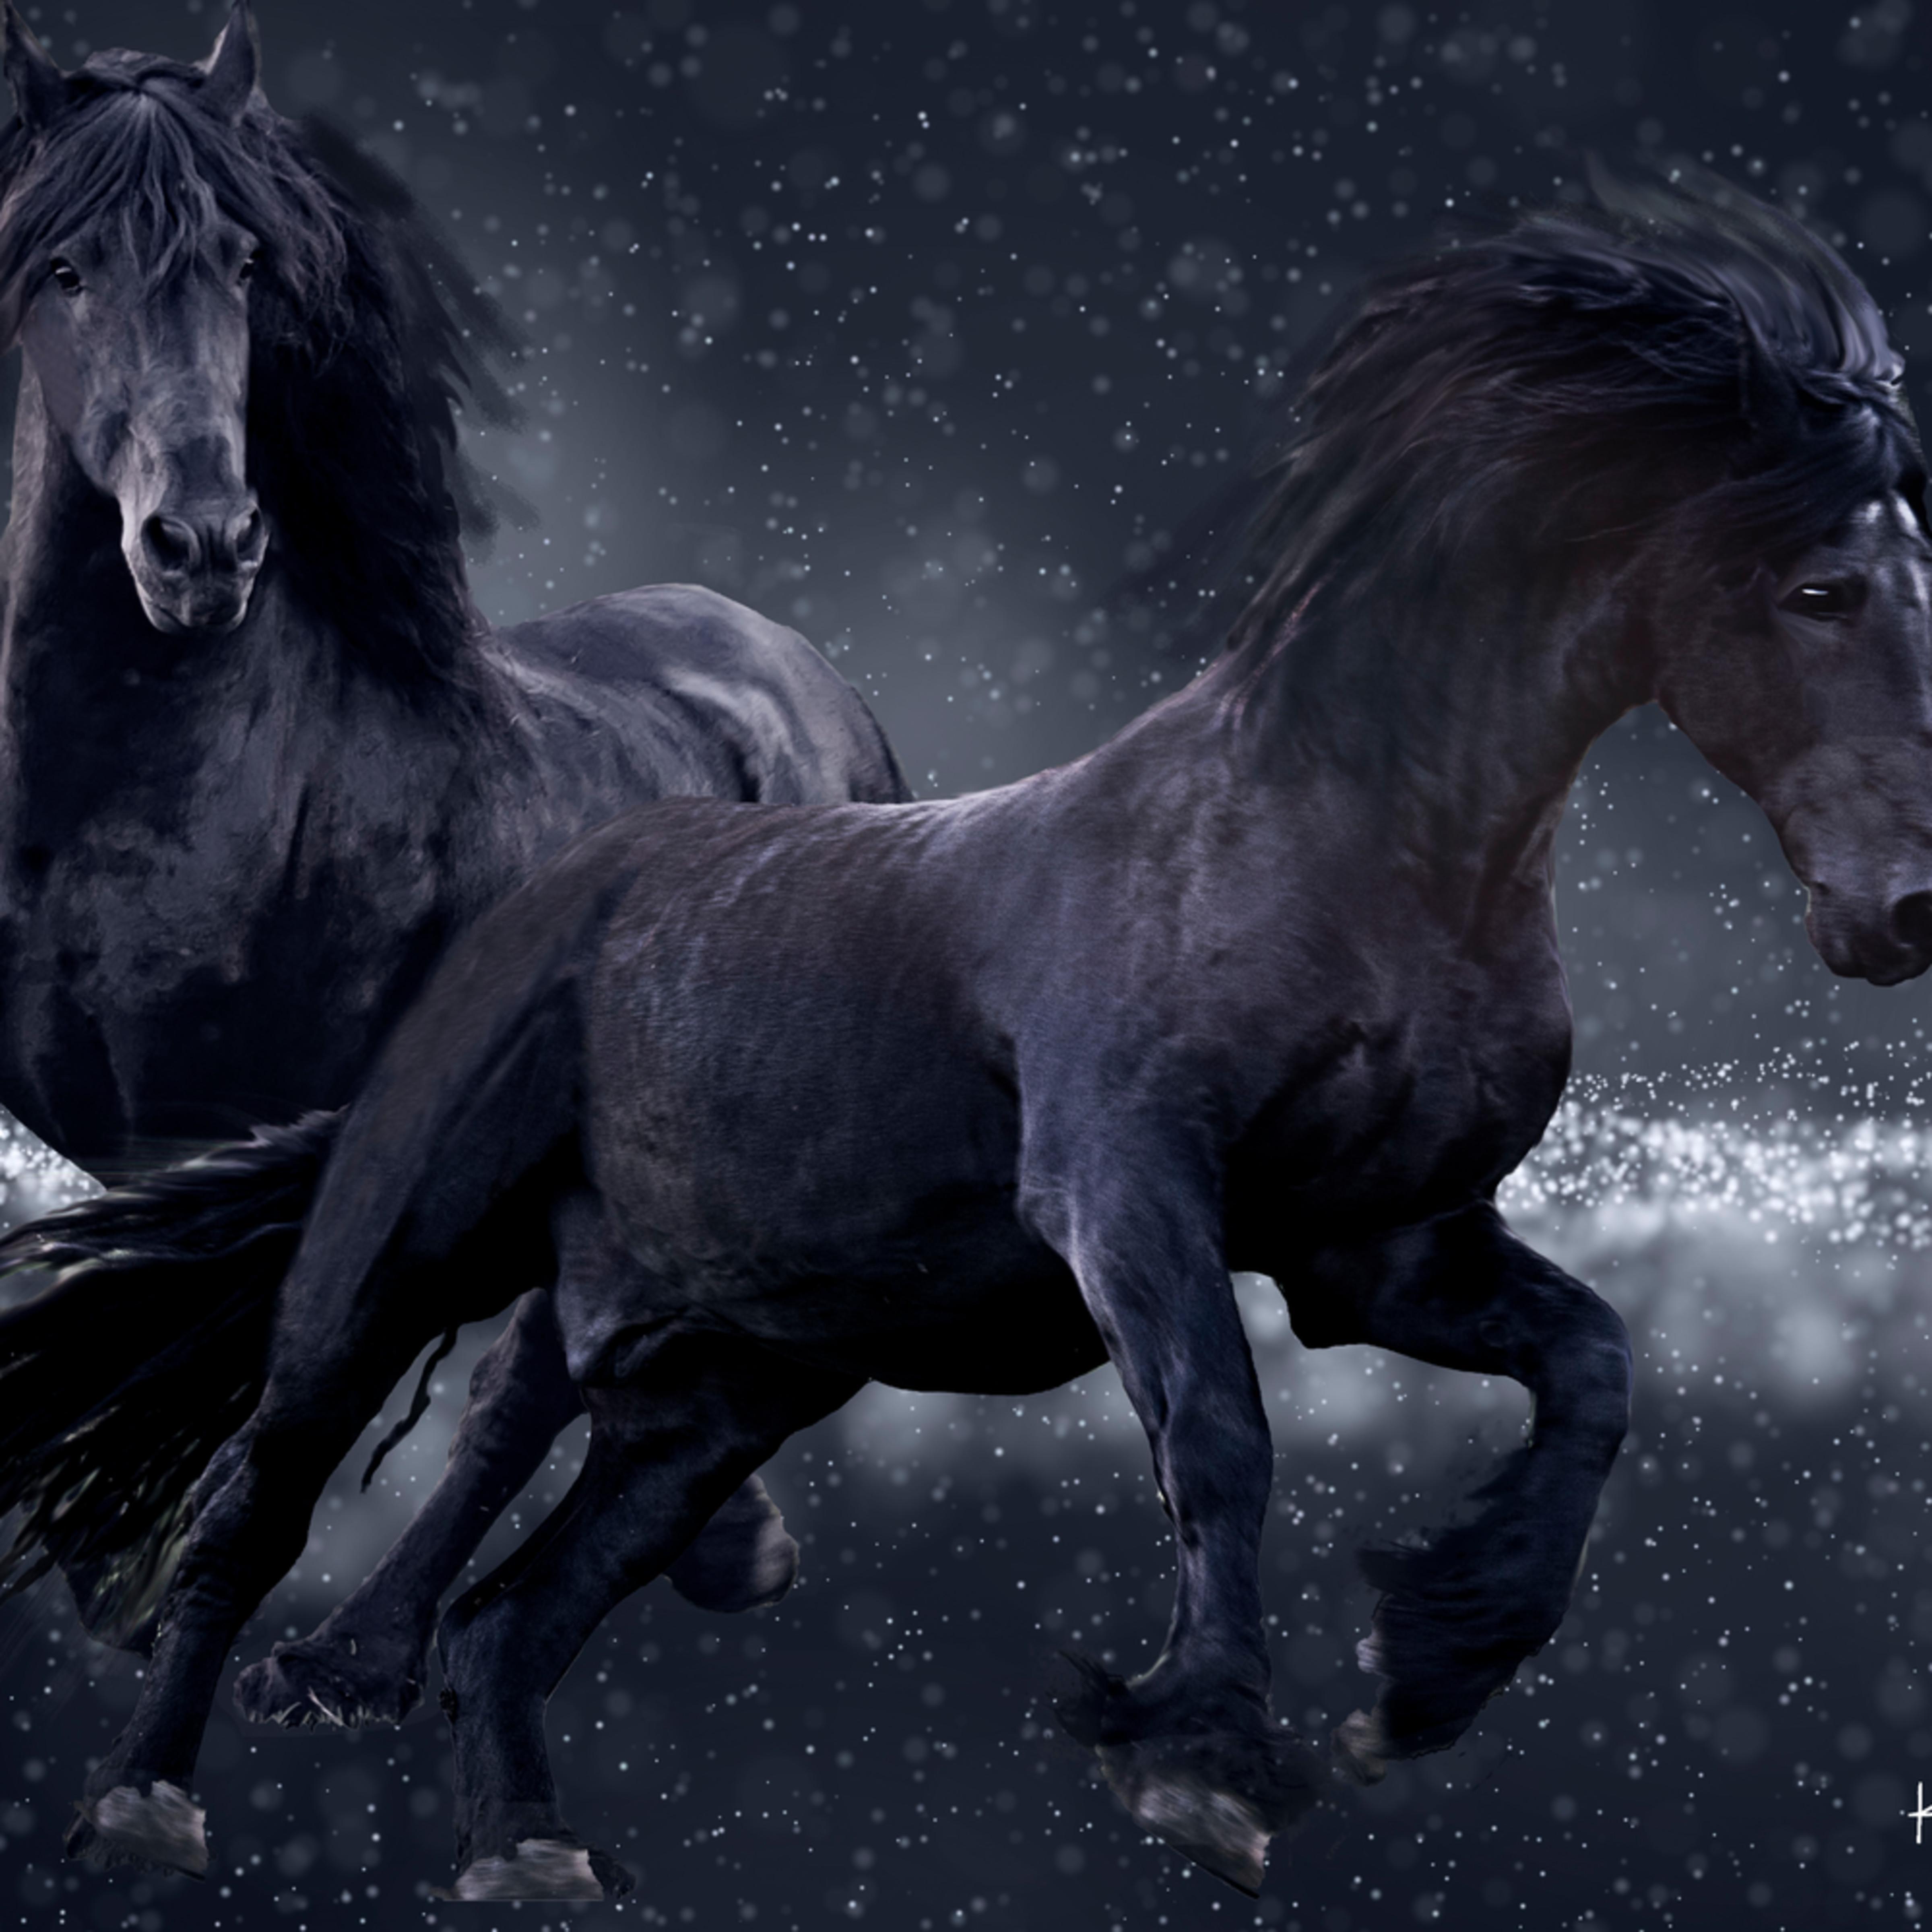 Midnight fresian race zdgwpc